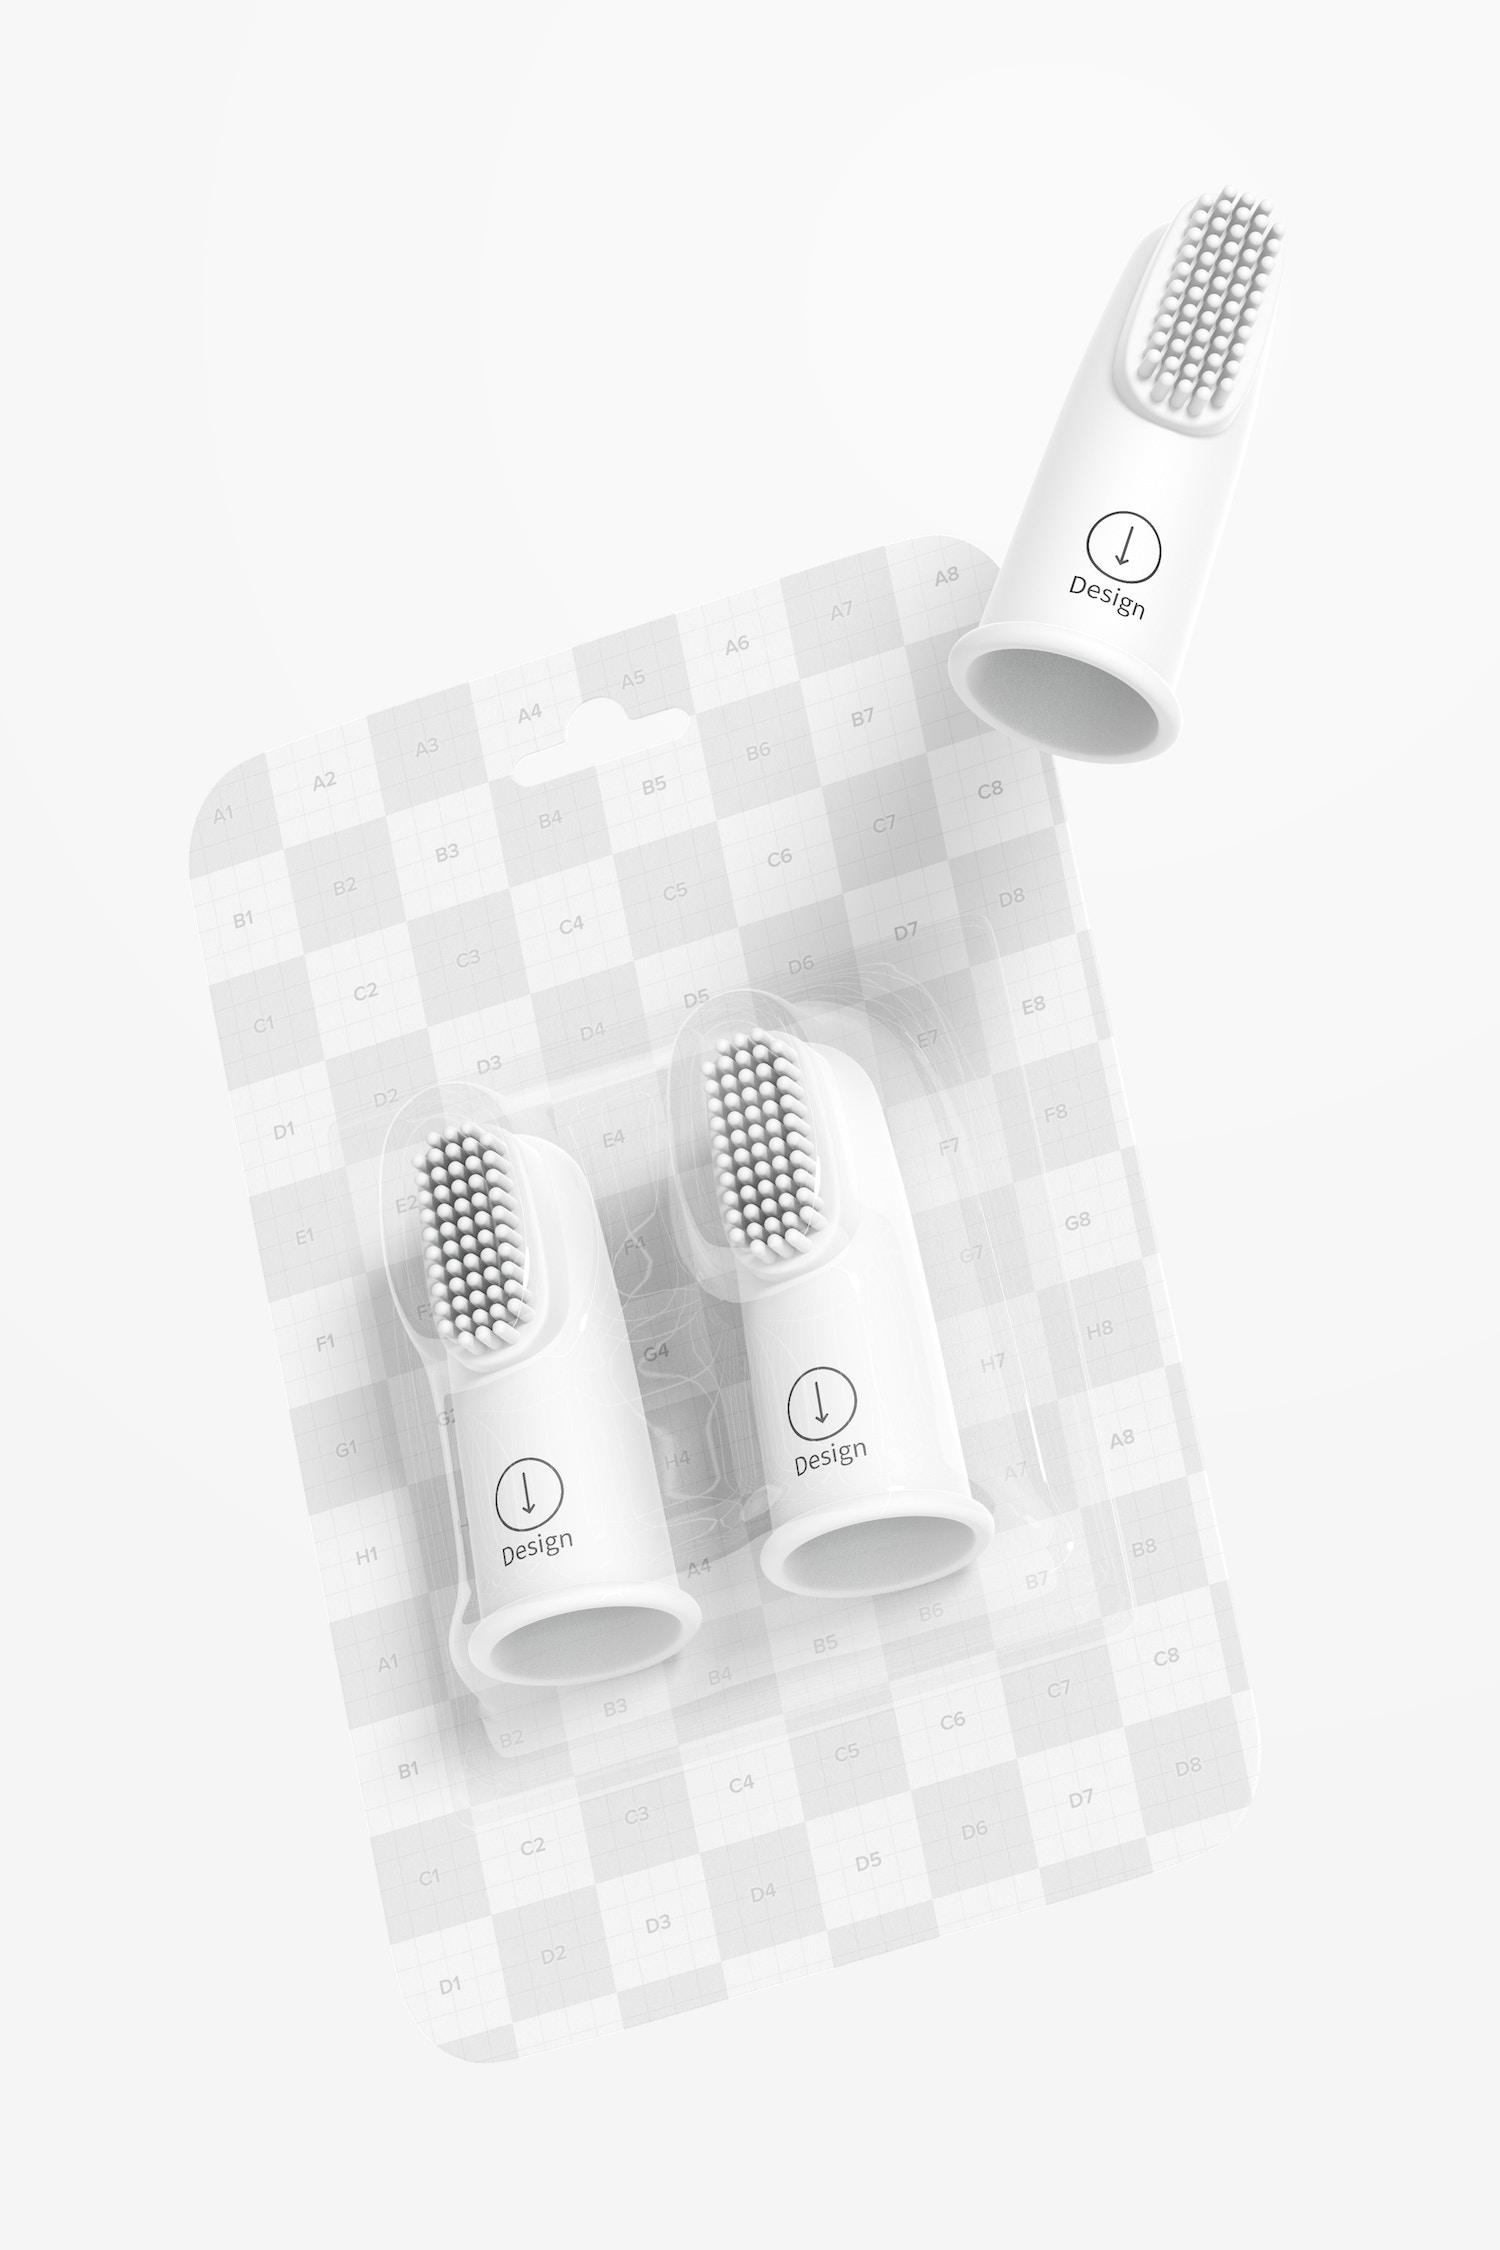 Baby Toothbrush Blister Mockup, Floating